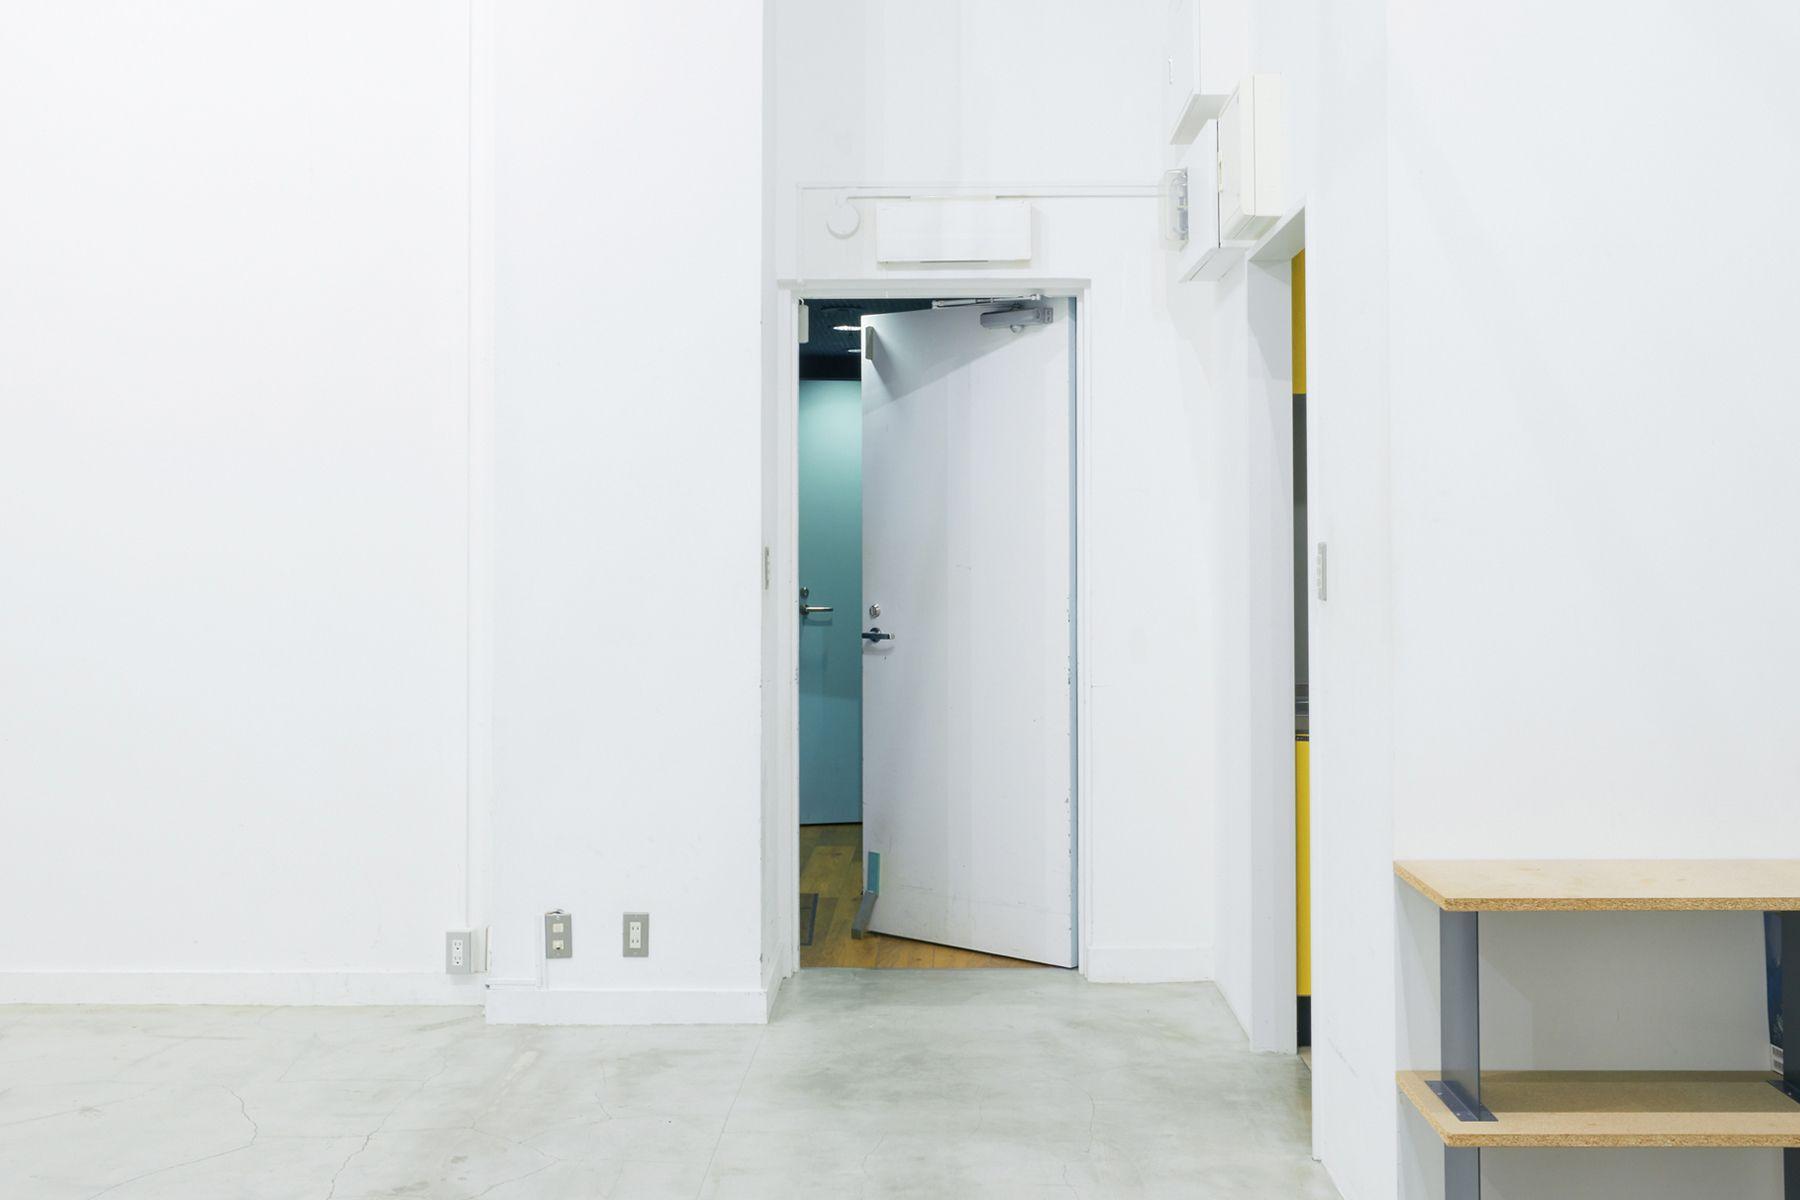 sinca studio 中野坂上 (シンカ スタジオ)撮影に集中できる空間